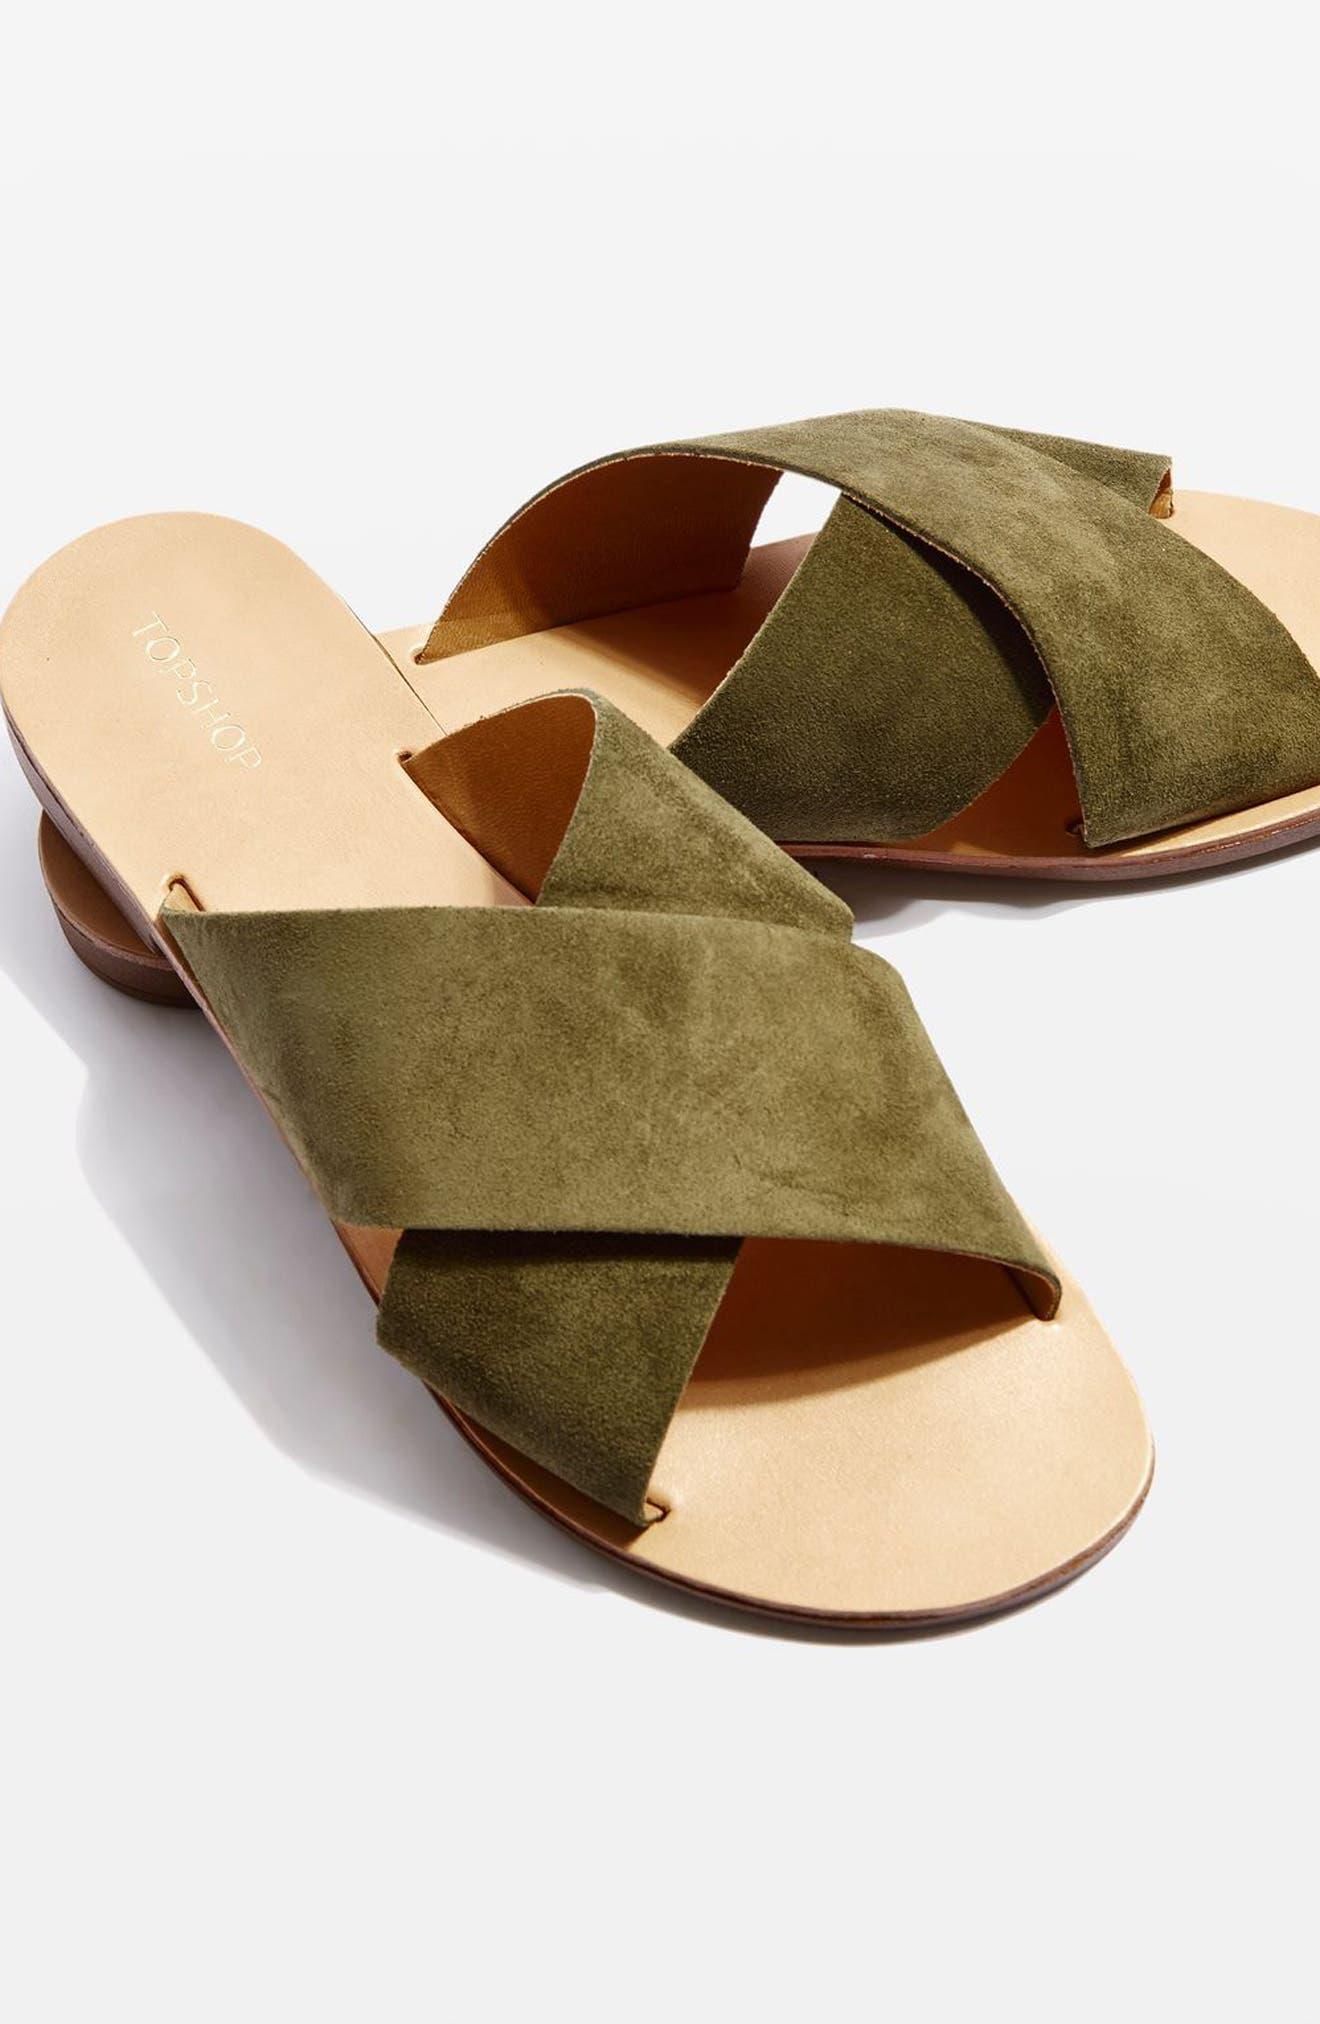 Alternate Image 1 Selected - Topshop Hawaii Crisscross Sandal (Women)